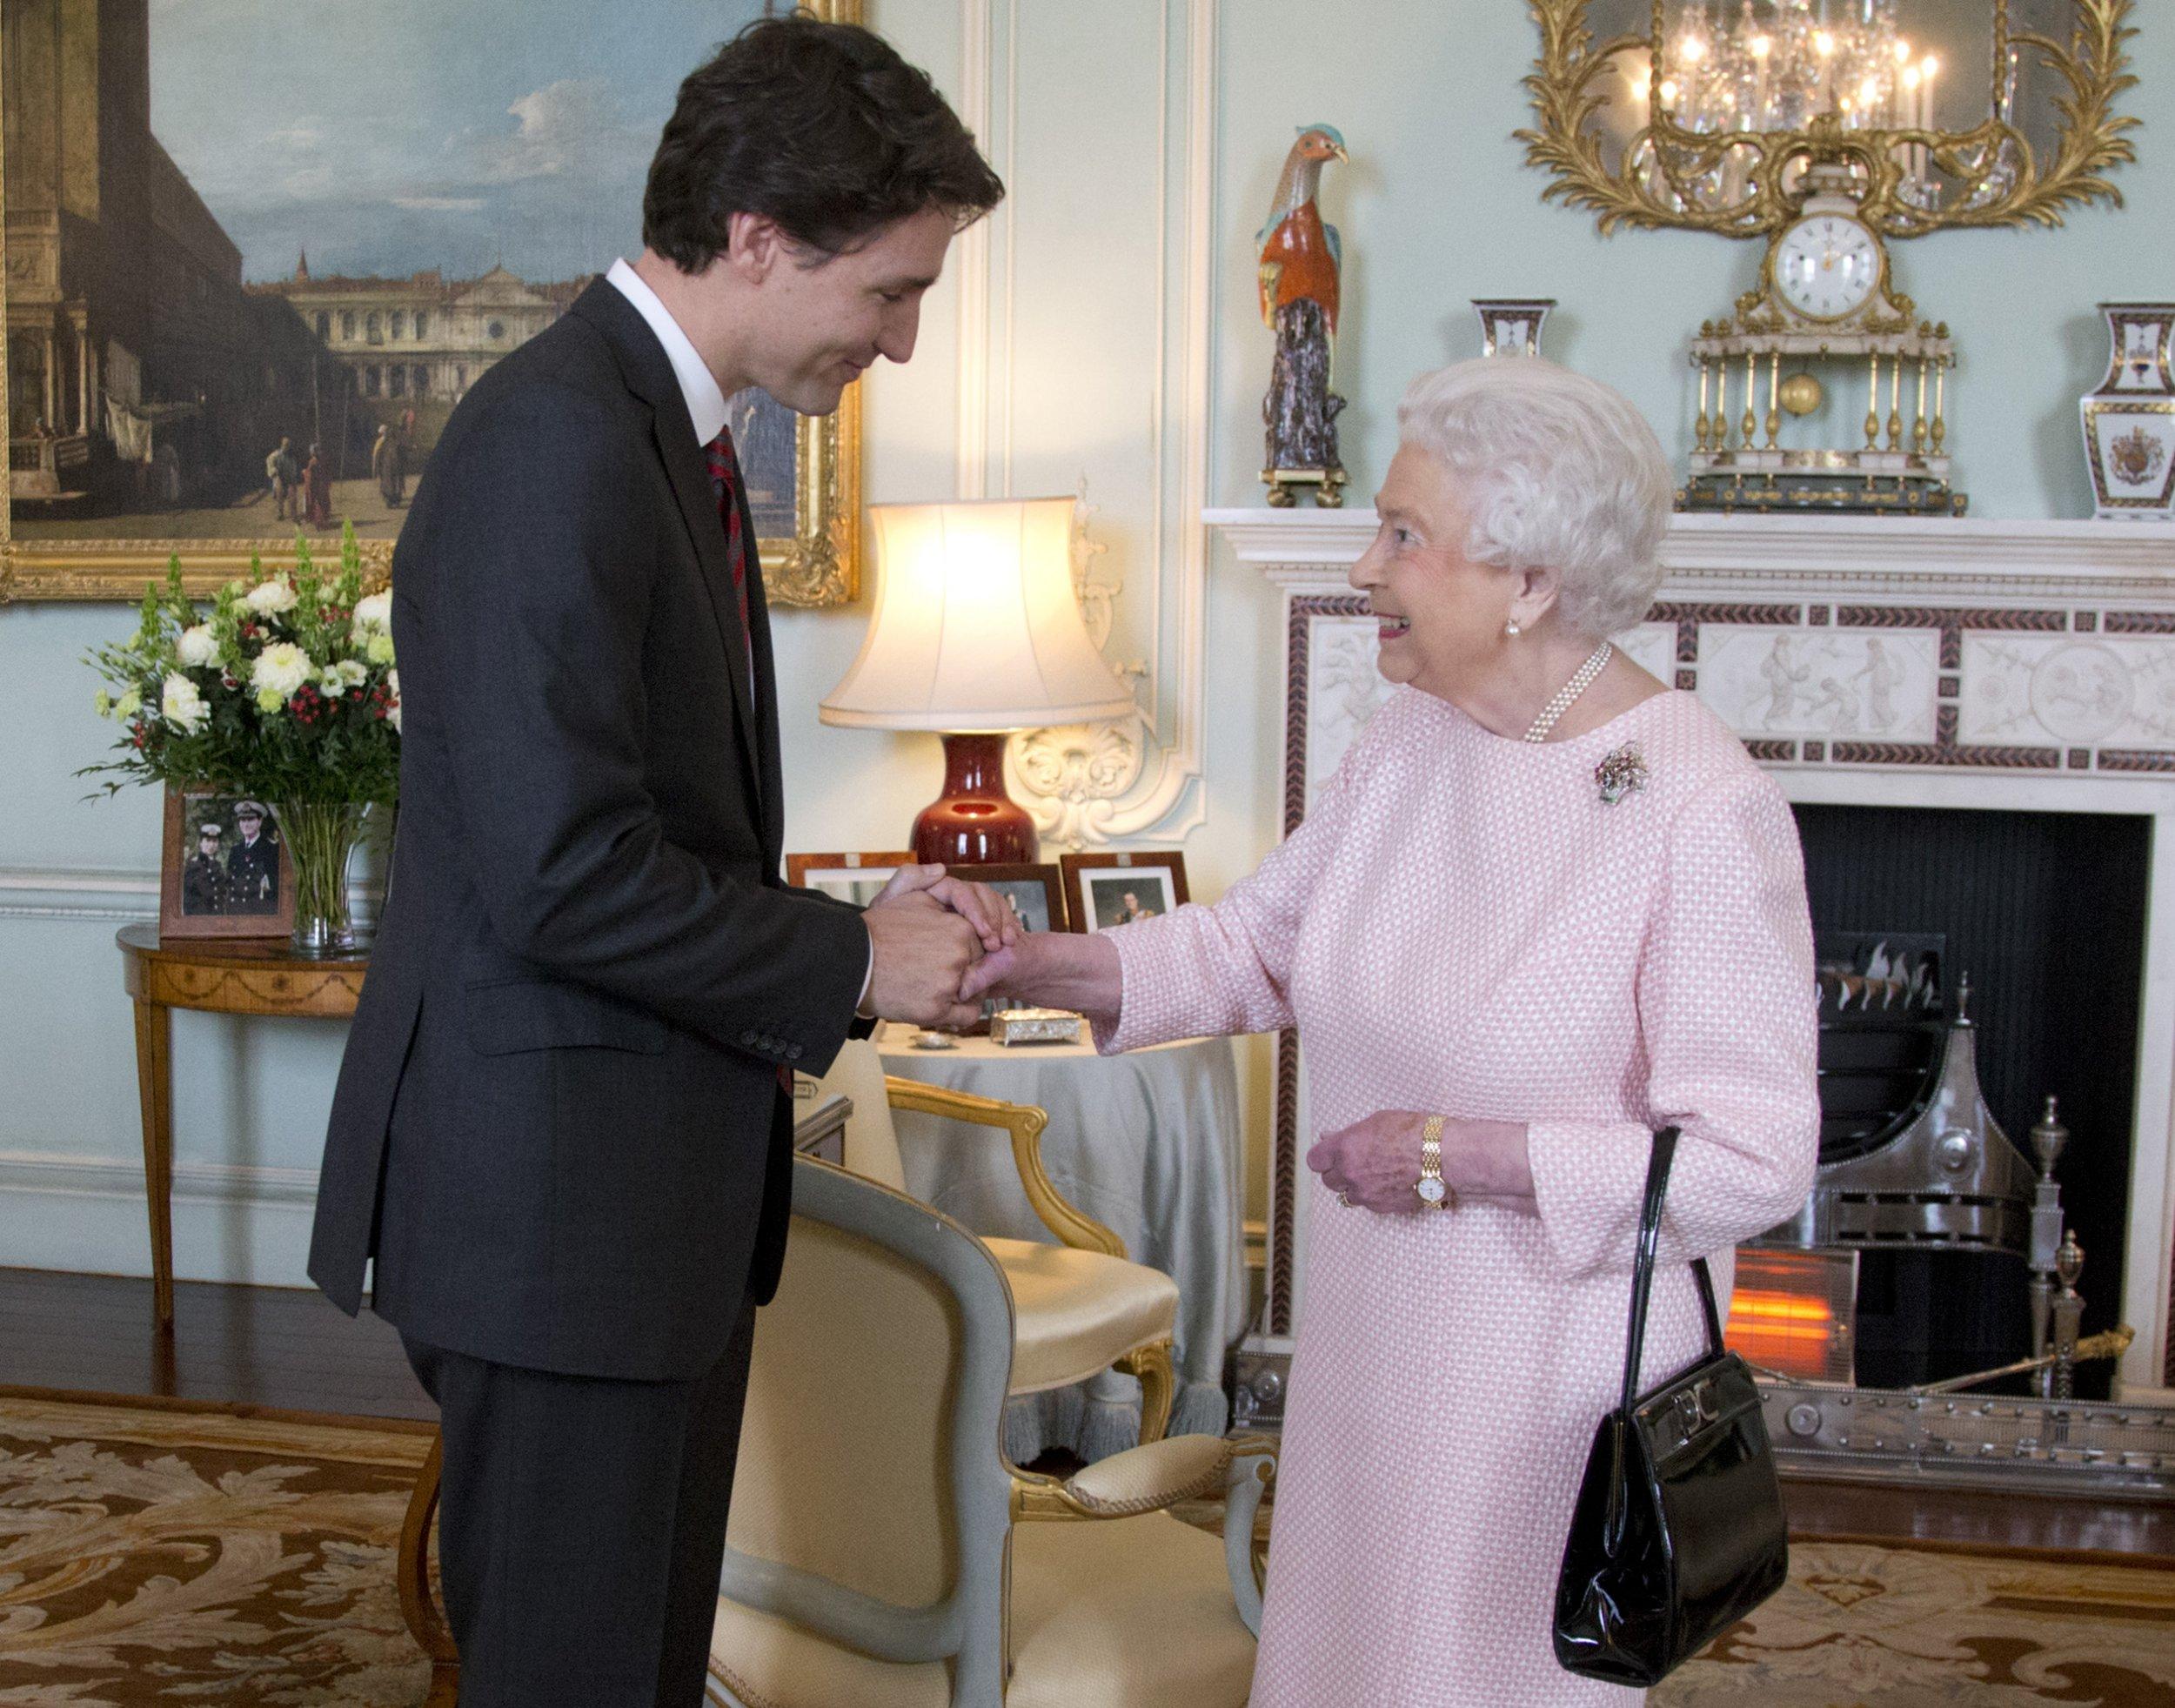 Queen Justin Trudeau